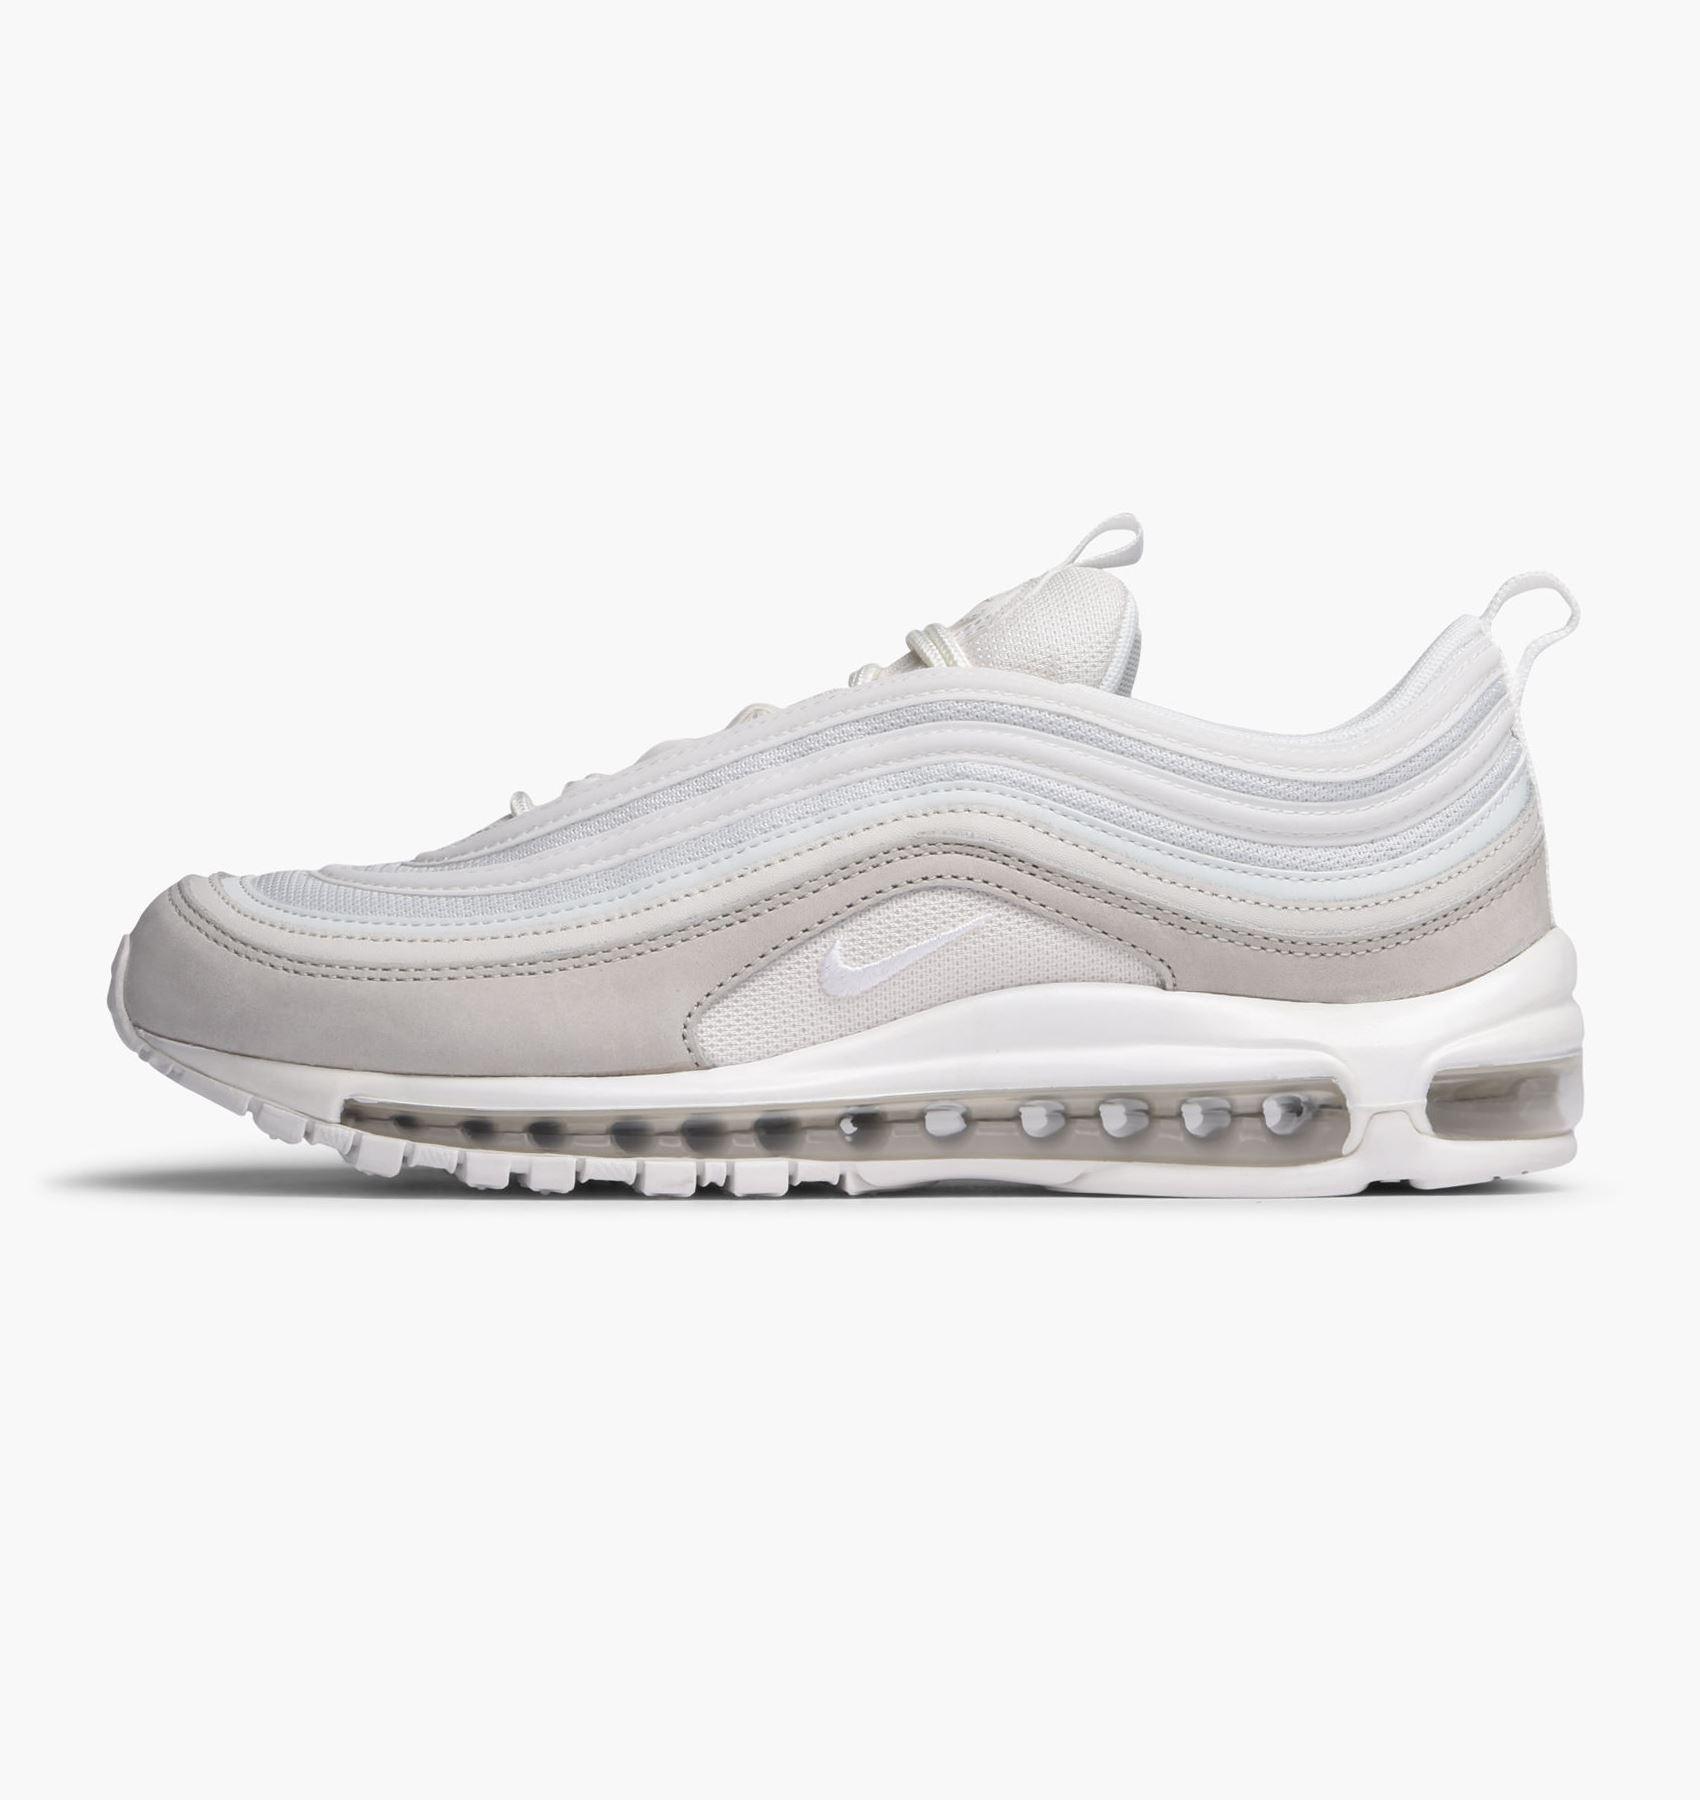 quality design 20259 aa199 Details about Nike Air Max 97 Premium Light Bone   Summit White 312834 006  Mens UK 9-10.5